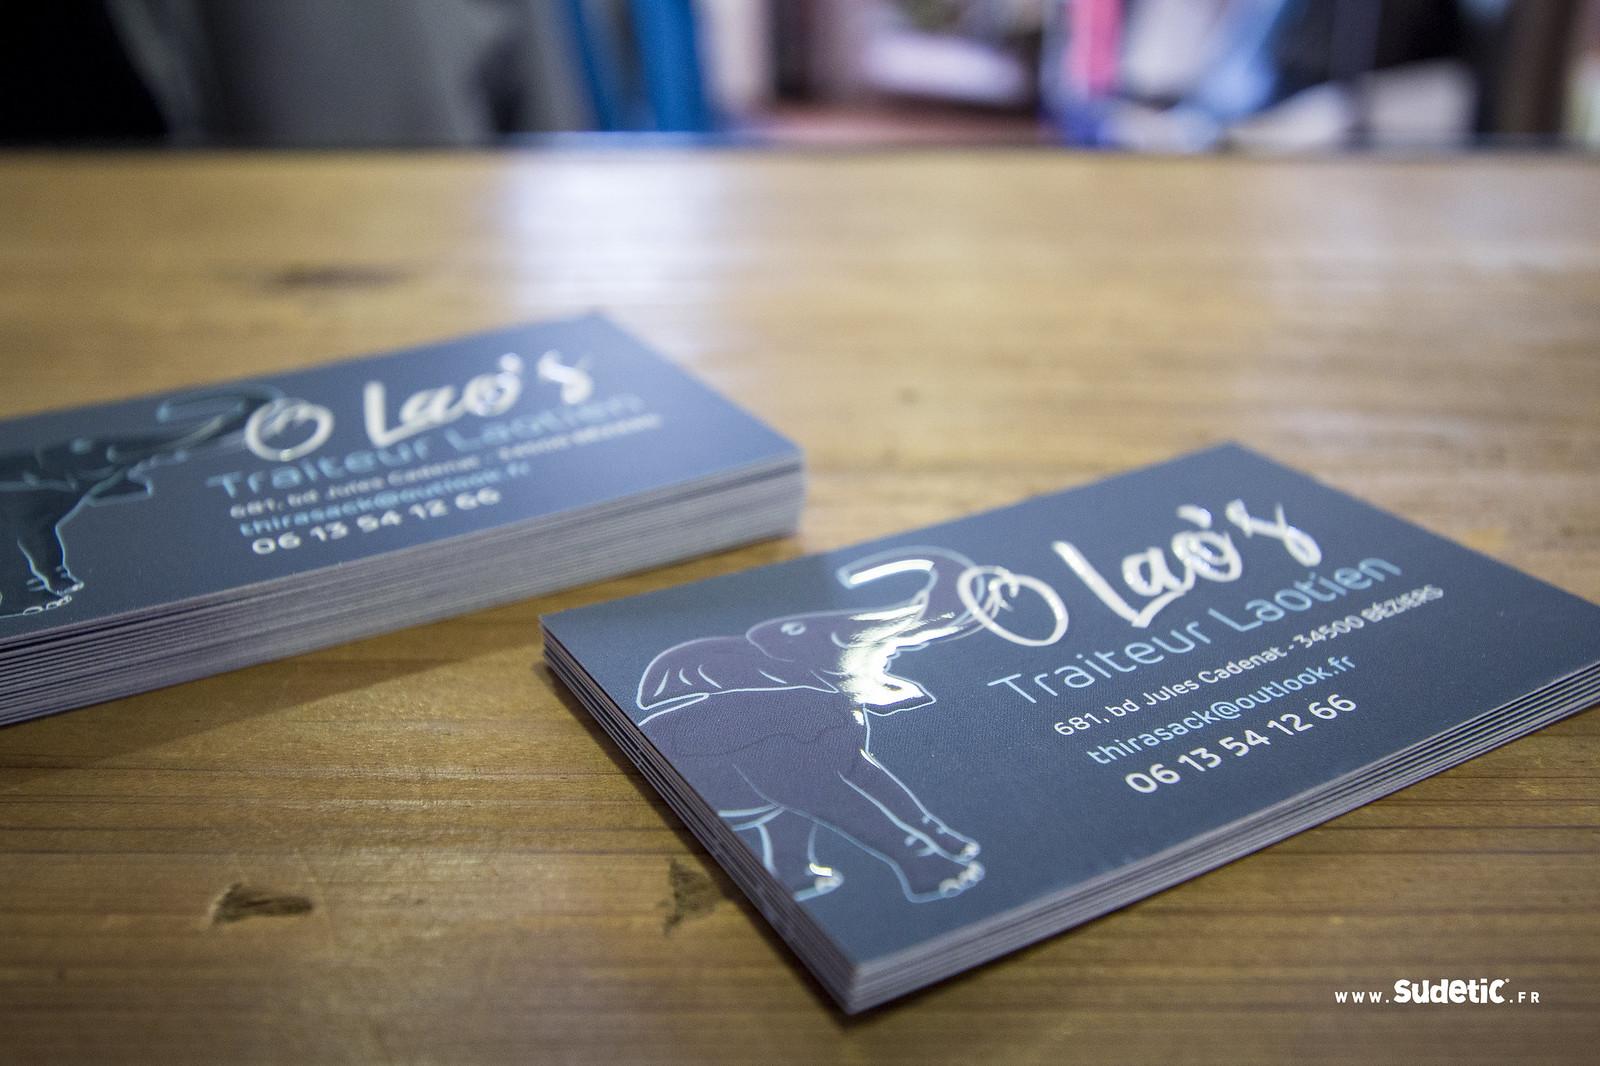 Sudetic cartes de visite O Lao's